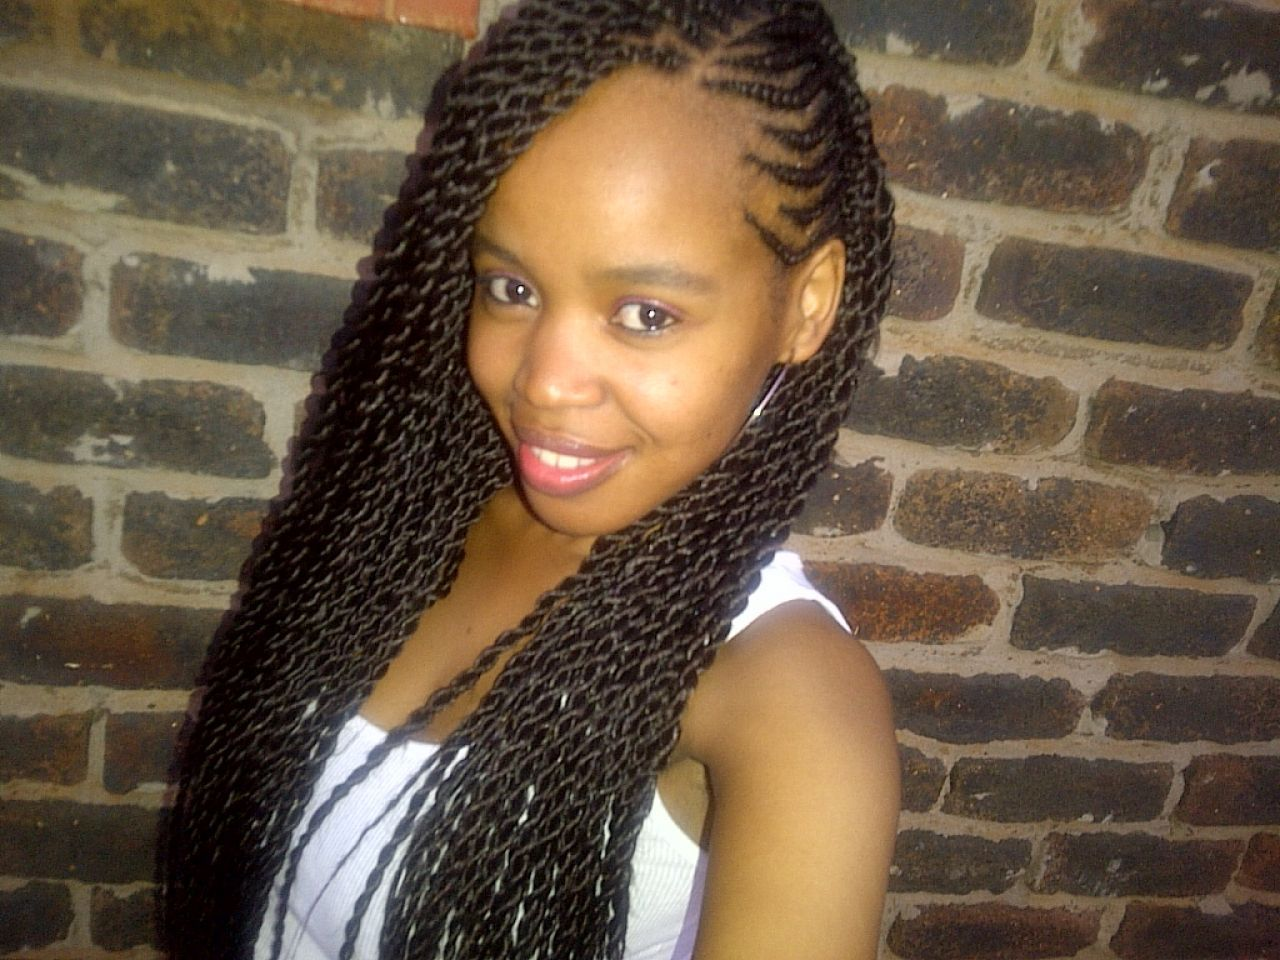 Sensational 1000 Images About Braid My Hair On Pinterest Black Women Short Hairstyles Gunalazisus